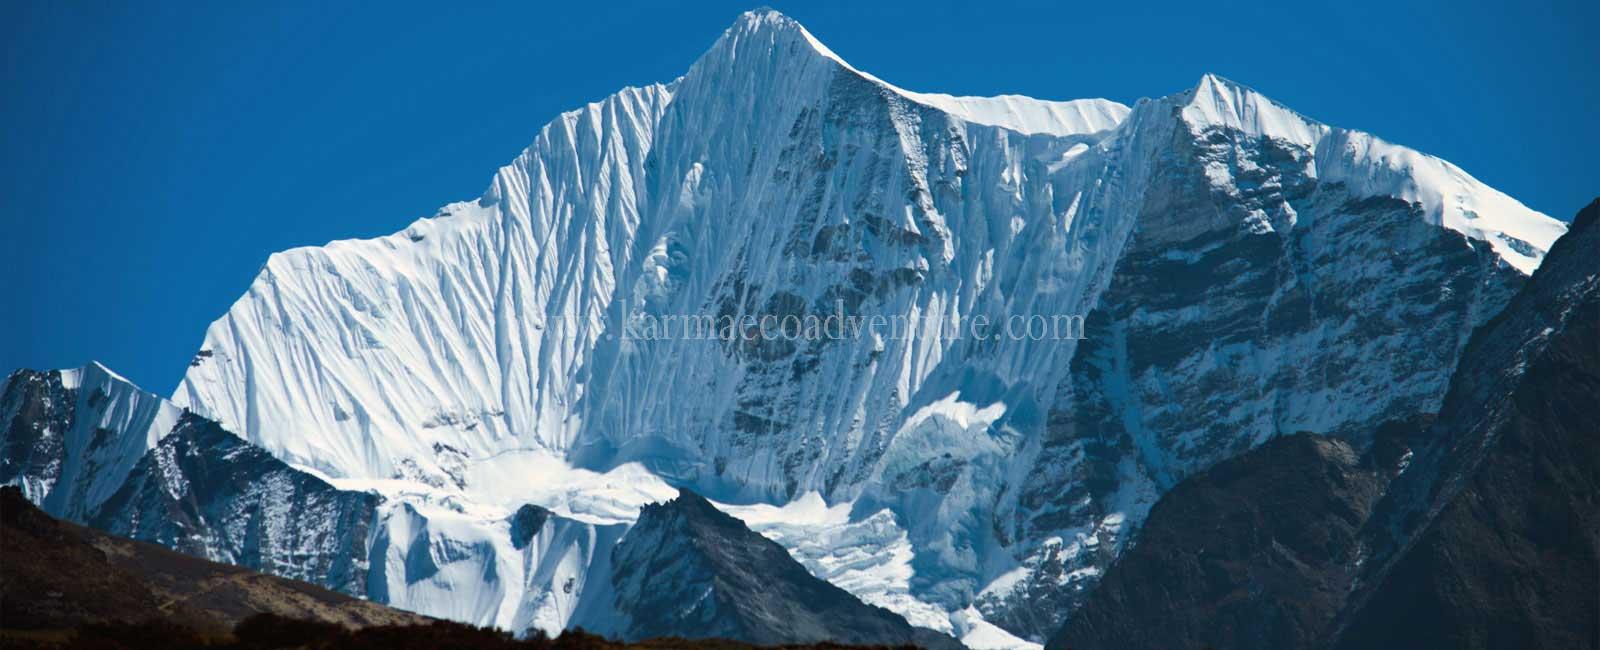 Peak Climbing in Nepal